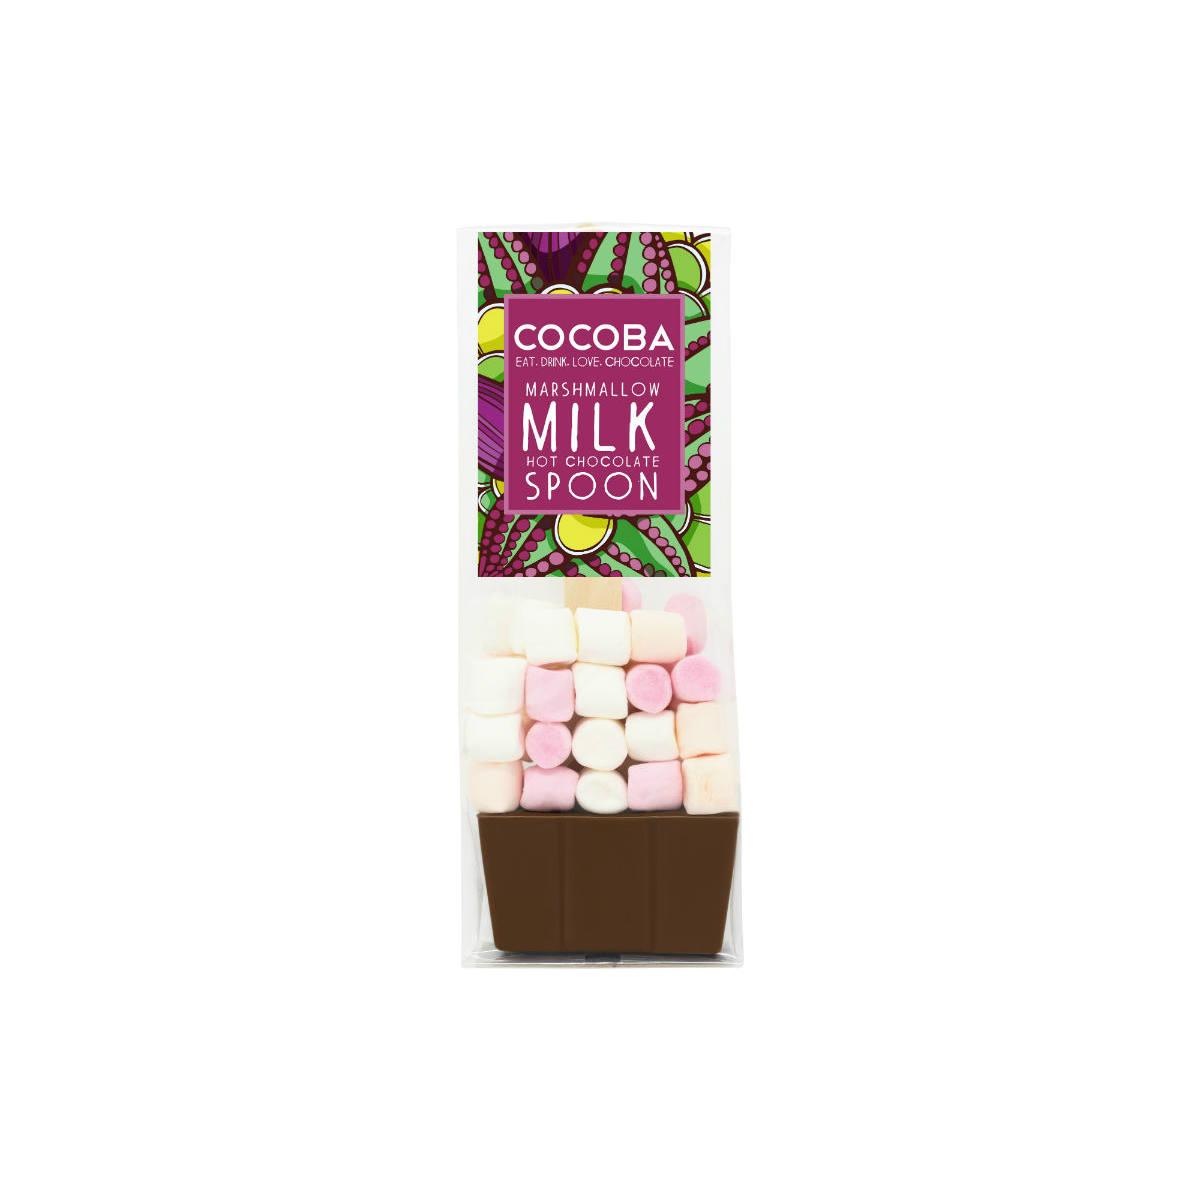 Cocoba Hot Choc Spoon Marshmallow Milk   Restoration Yard